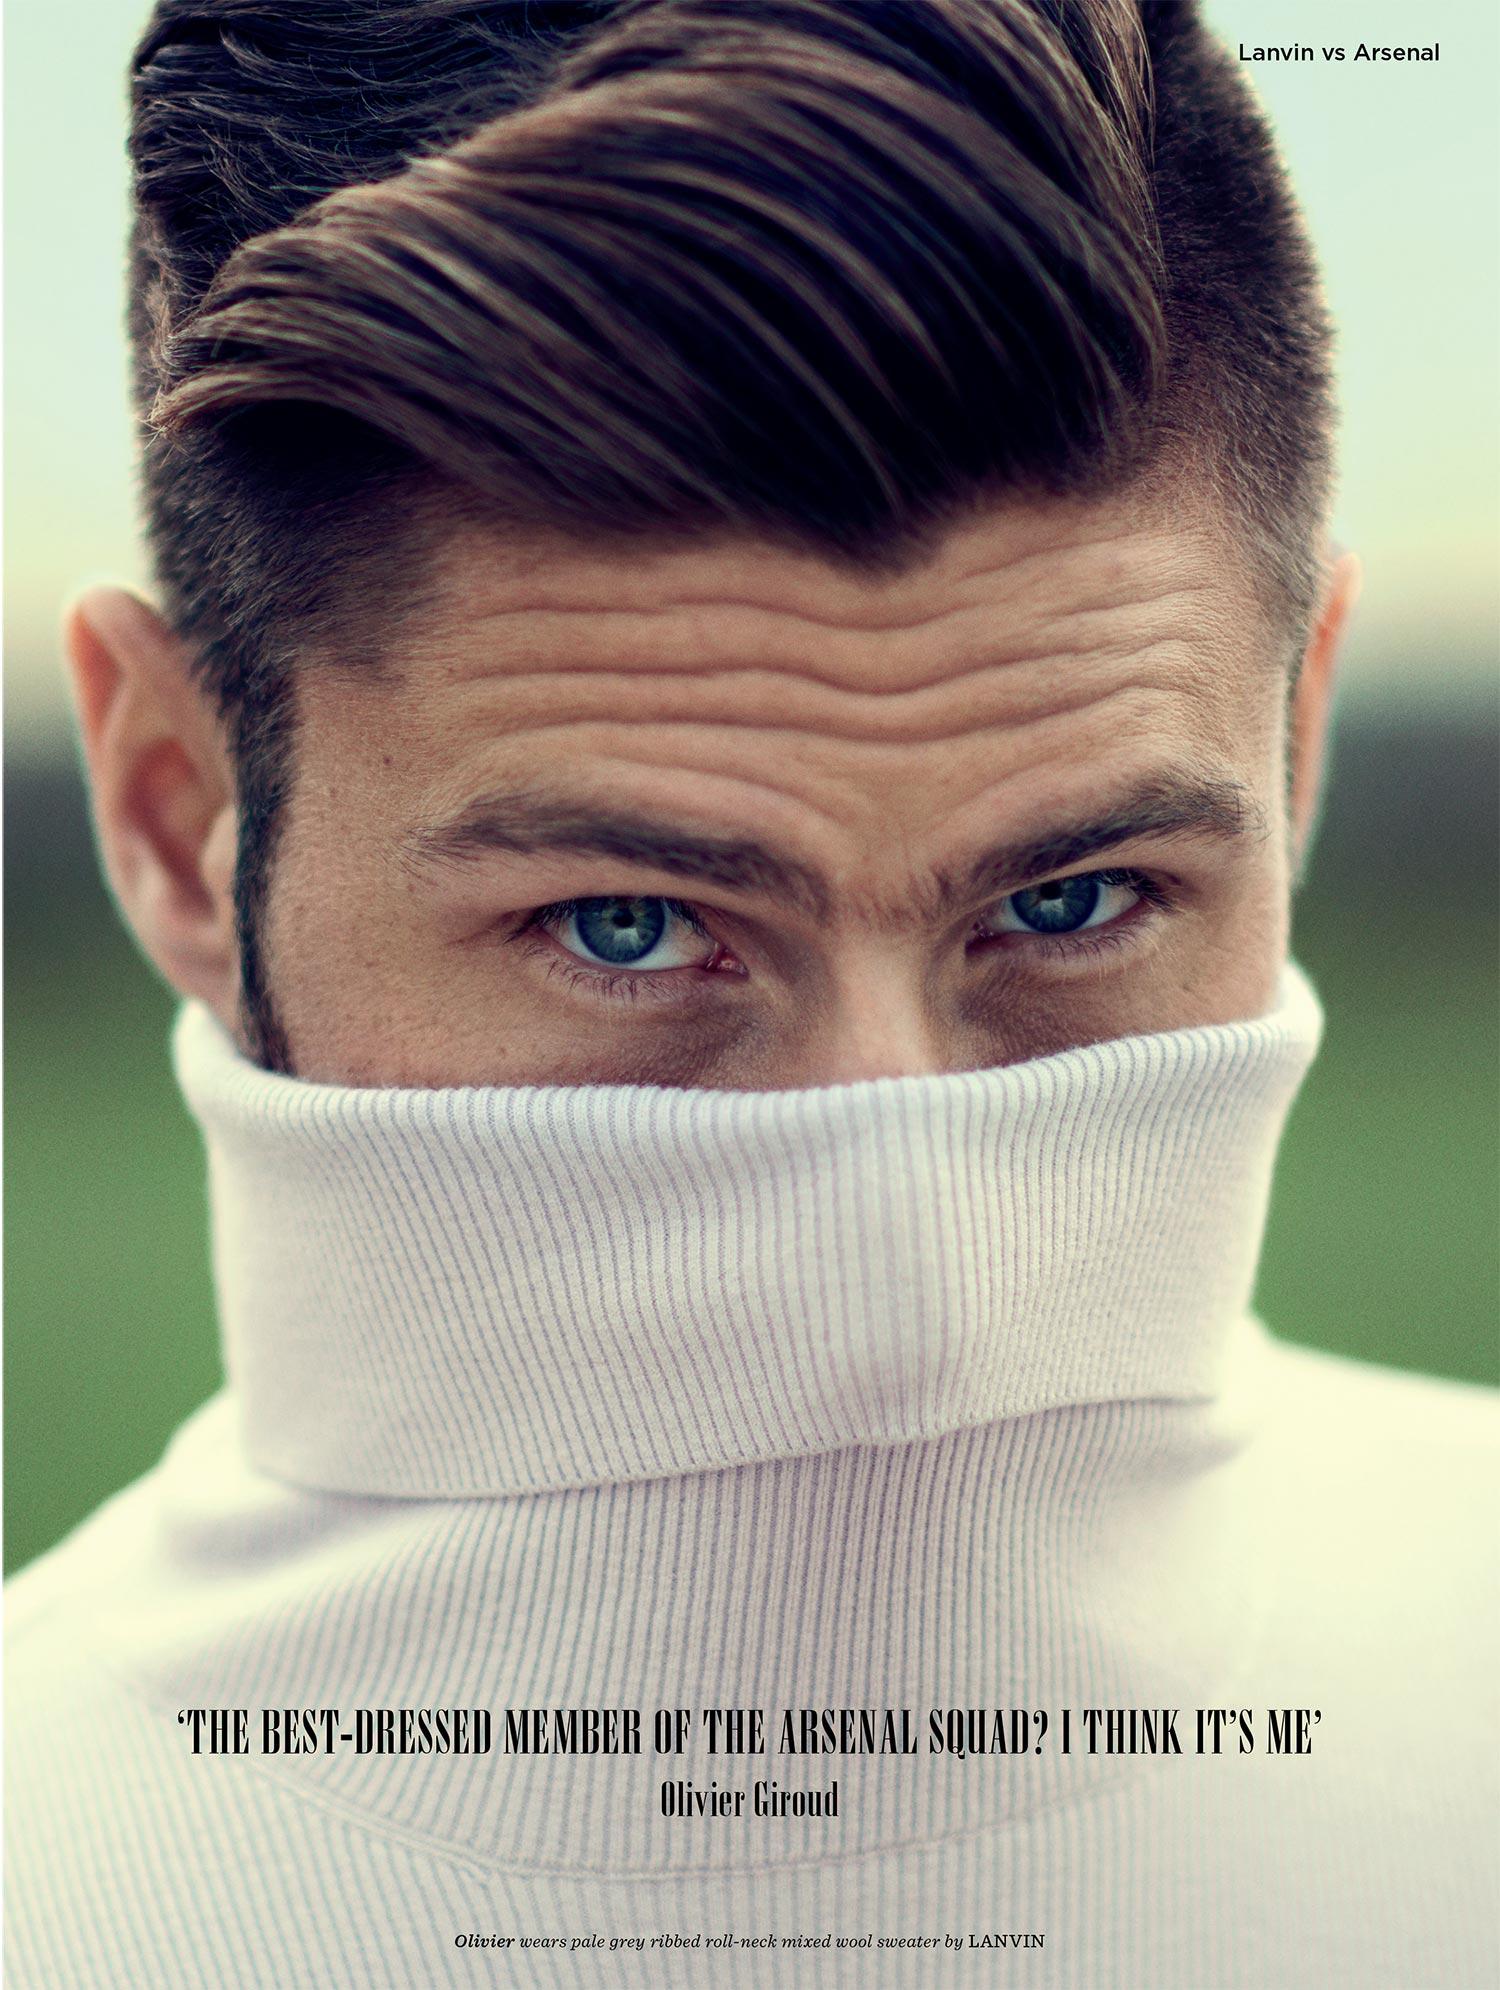 GQ Style - Lanvin V Arsenal